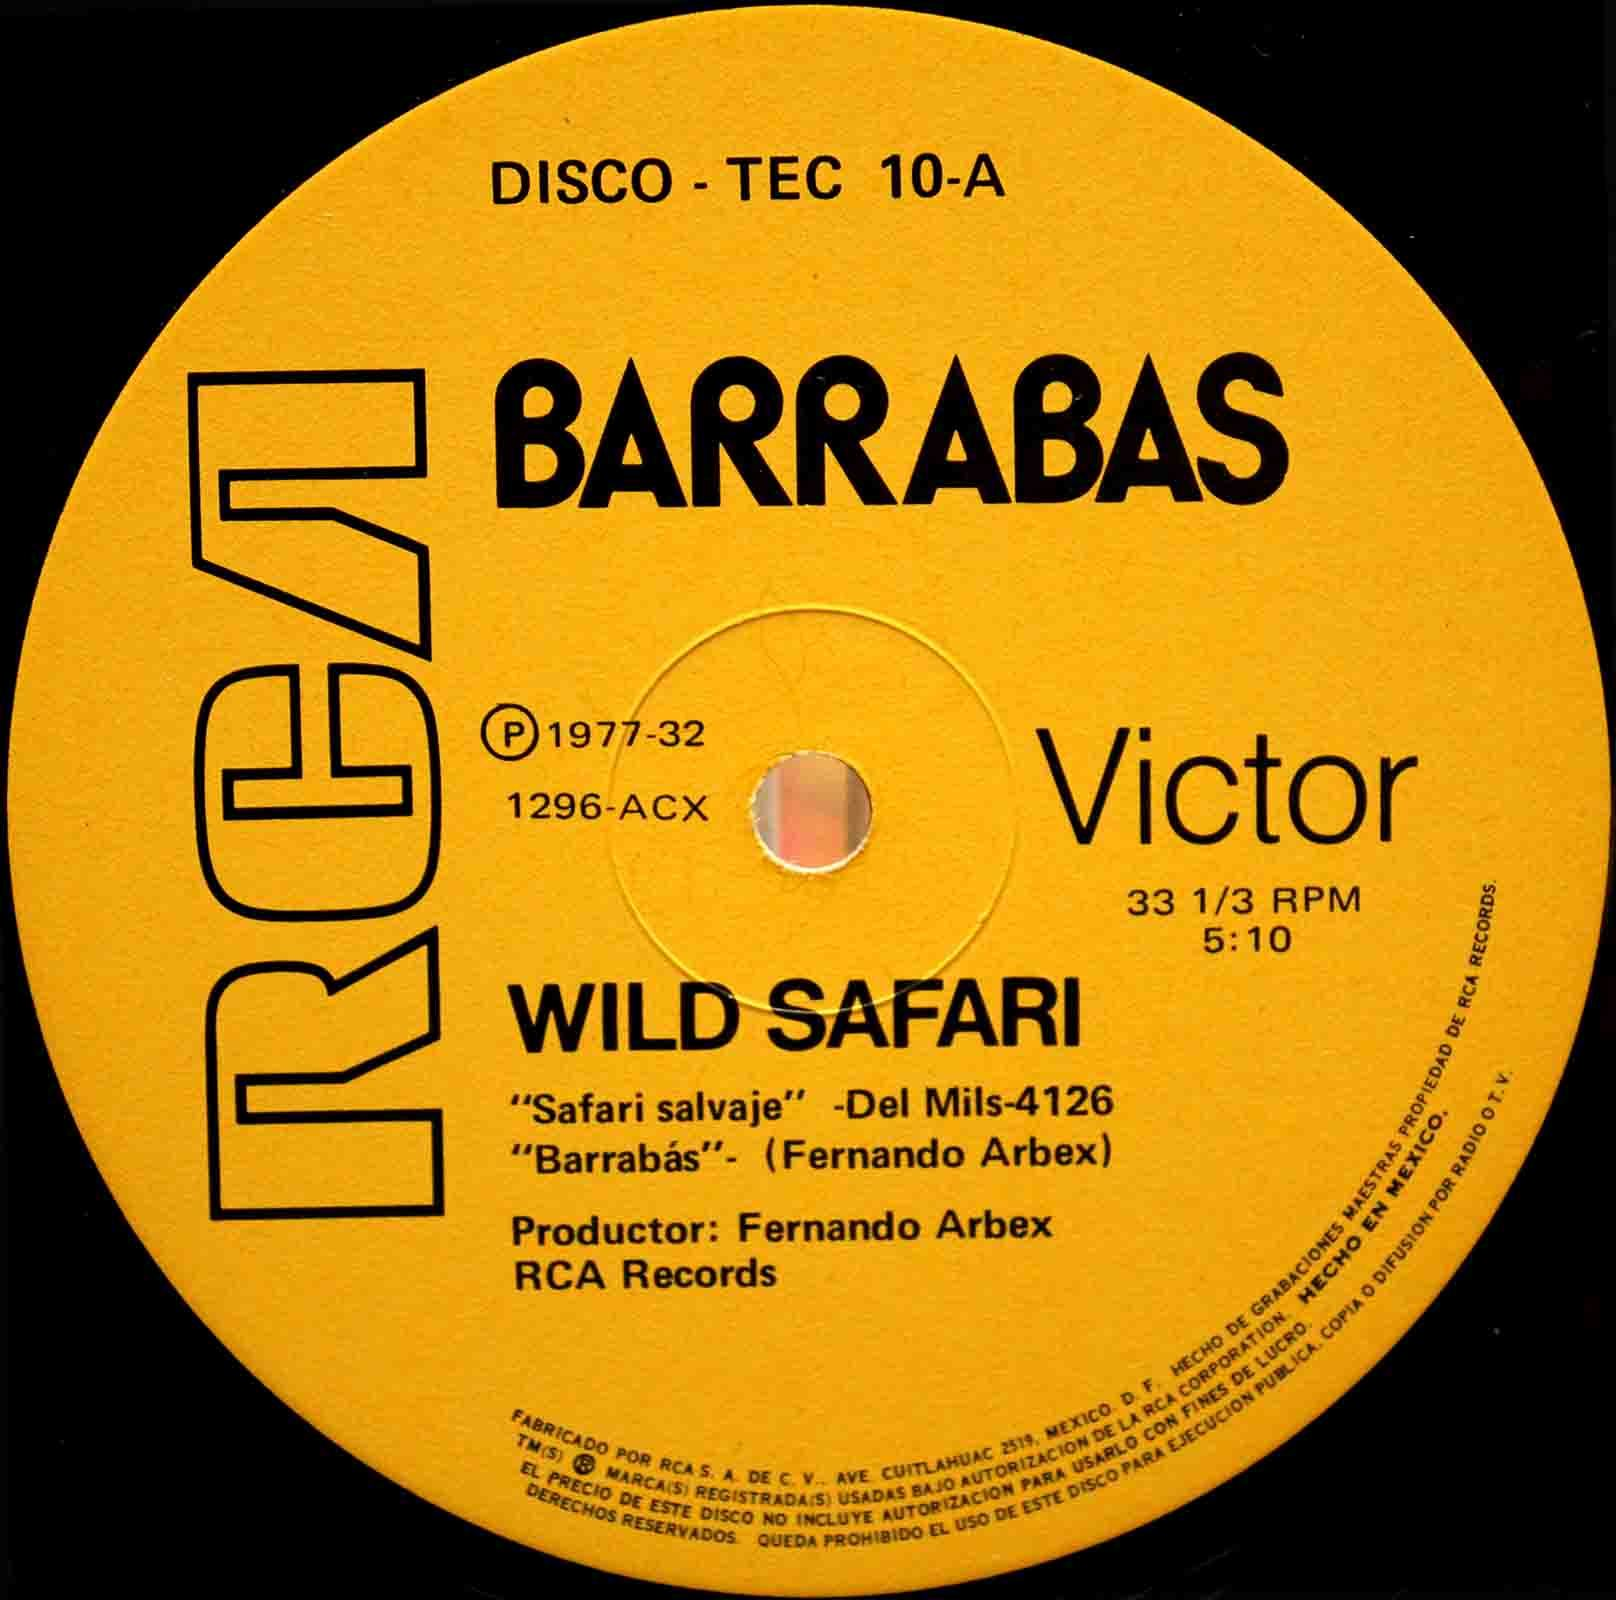 Barrabas Woman 04